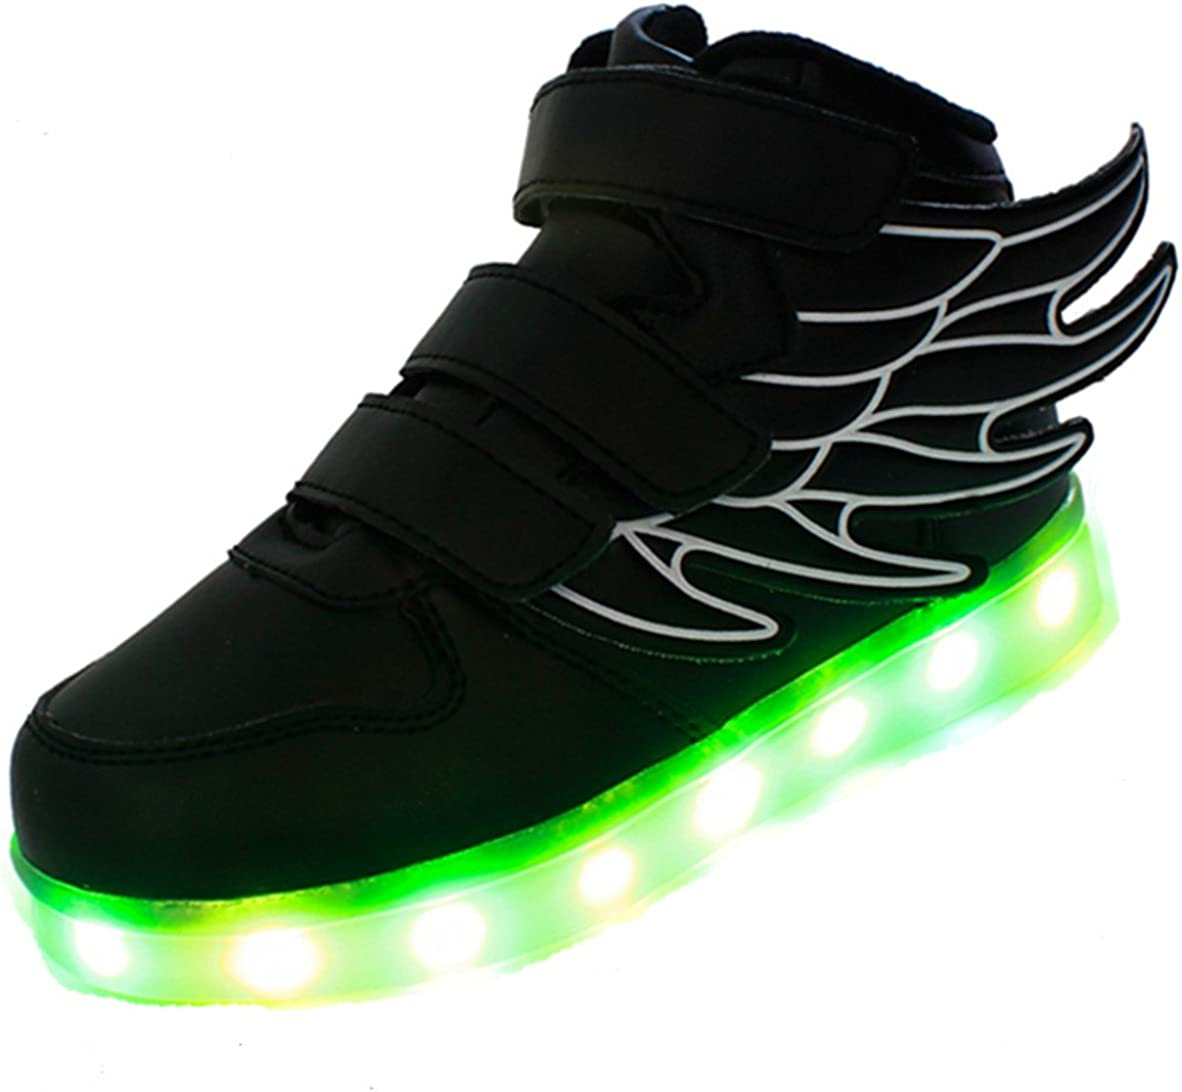 HarlanLi Boys Girls Wings Led Light Up Shoes USB Charging Flashing Fashion Sneakers Black